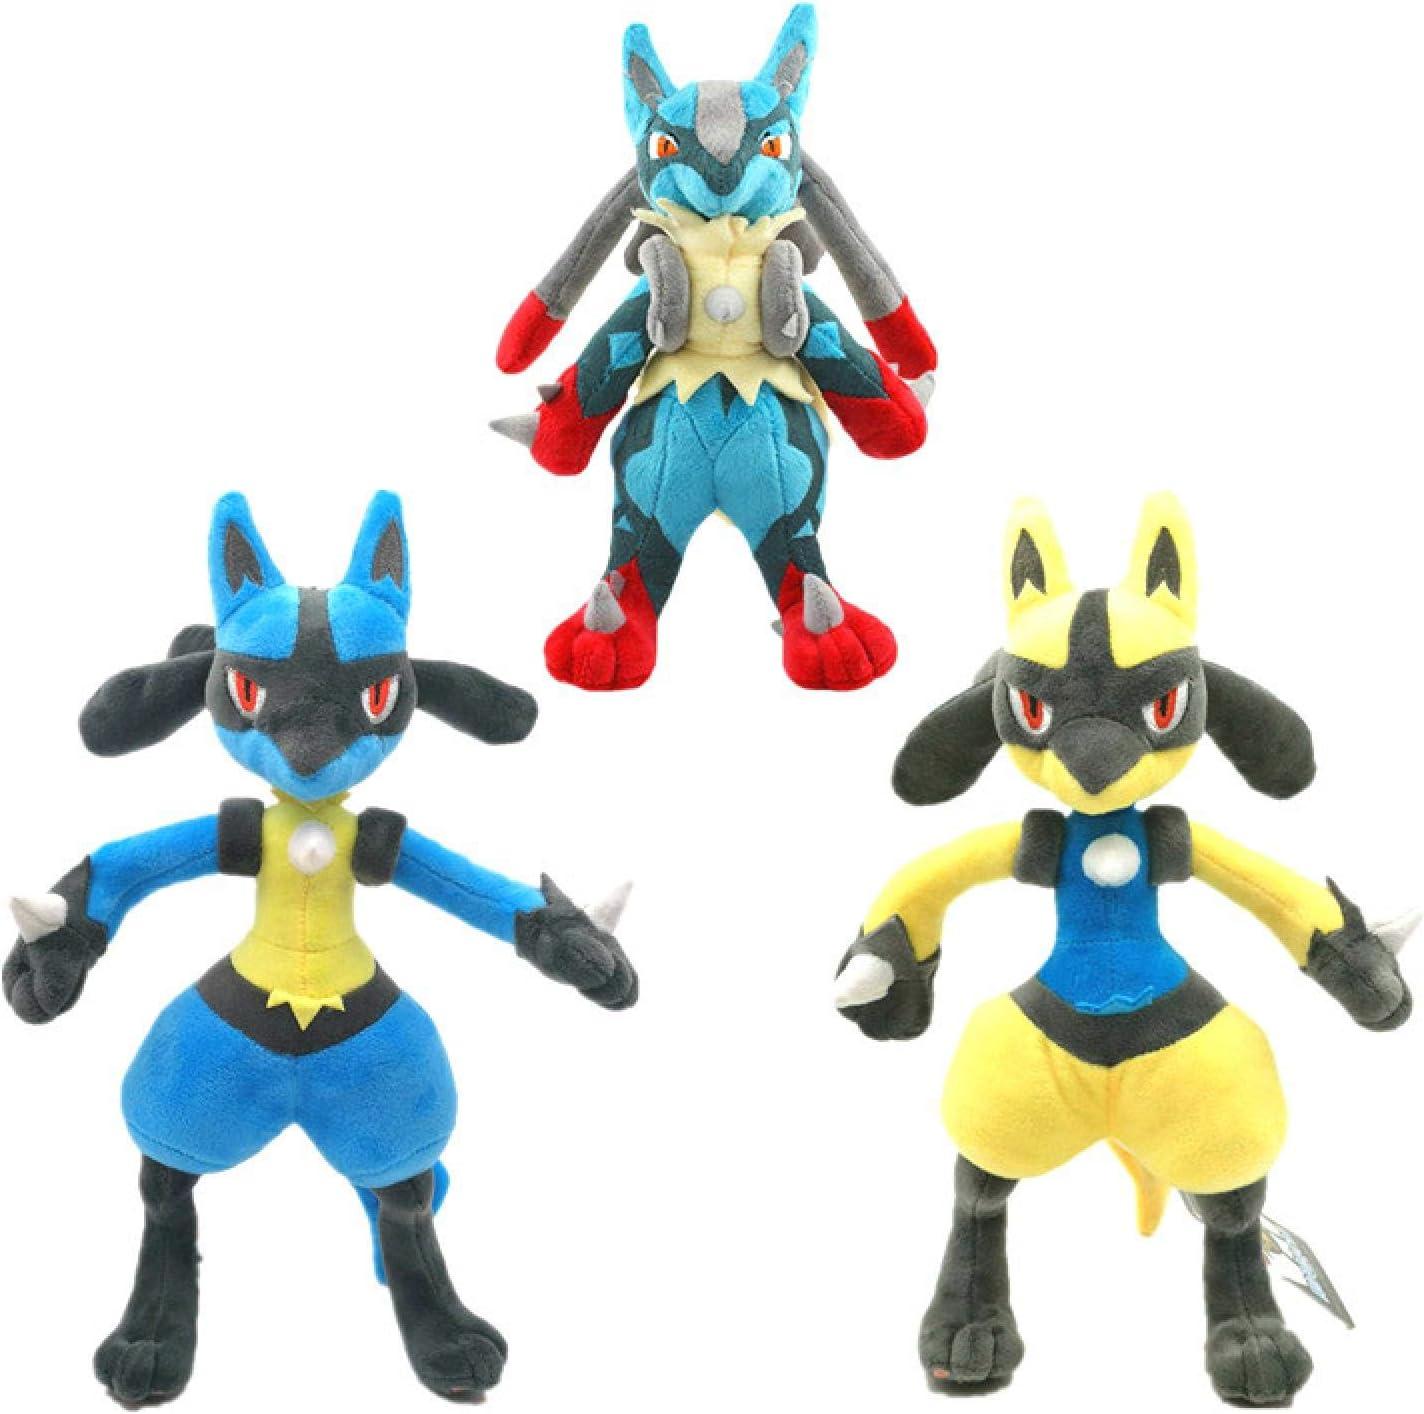 Max 89% OFF 3Pcs Pokemon Excellence Lucario Plush Toys Decorate Animals K Dolls Stuffed